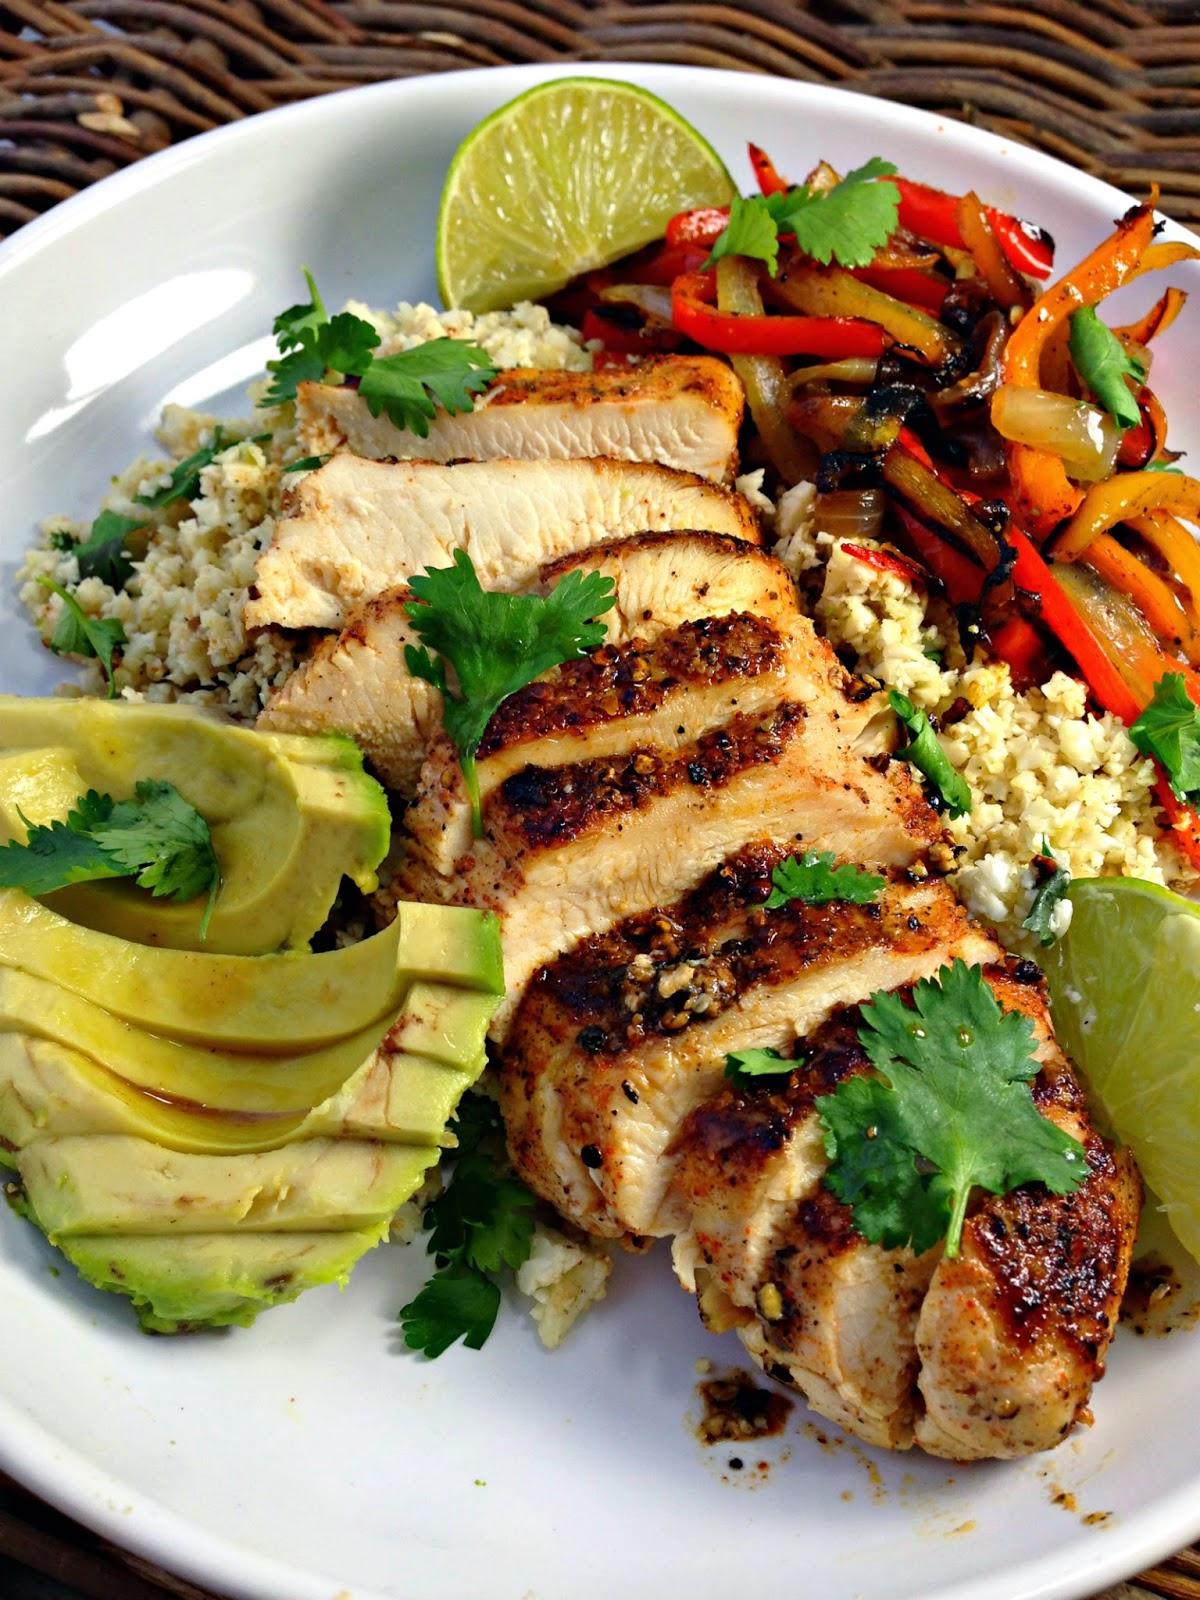 Healthy Blackened Chicken Fajitas with Cilantro Lime Cauliflower Rice